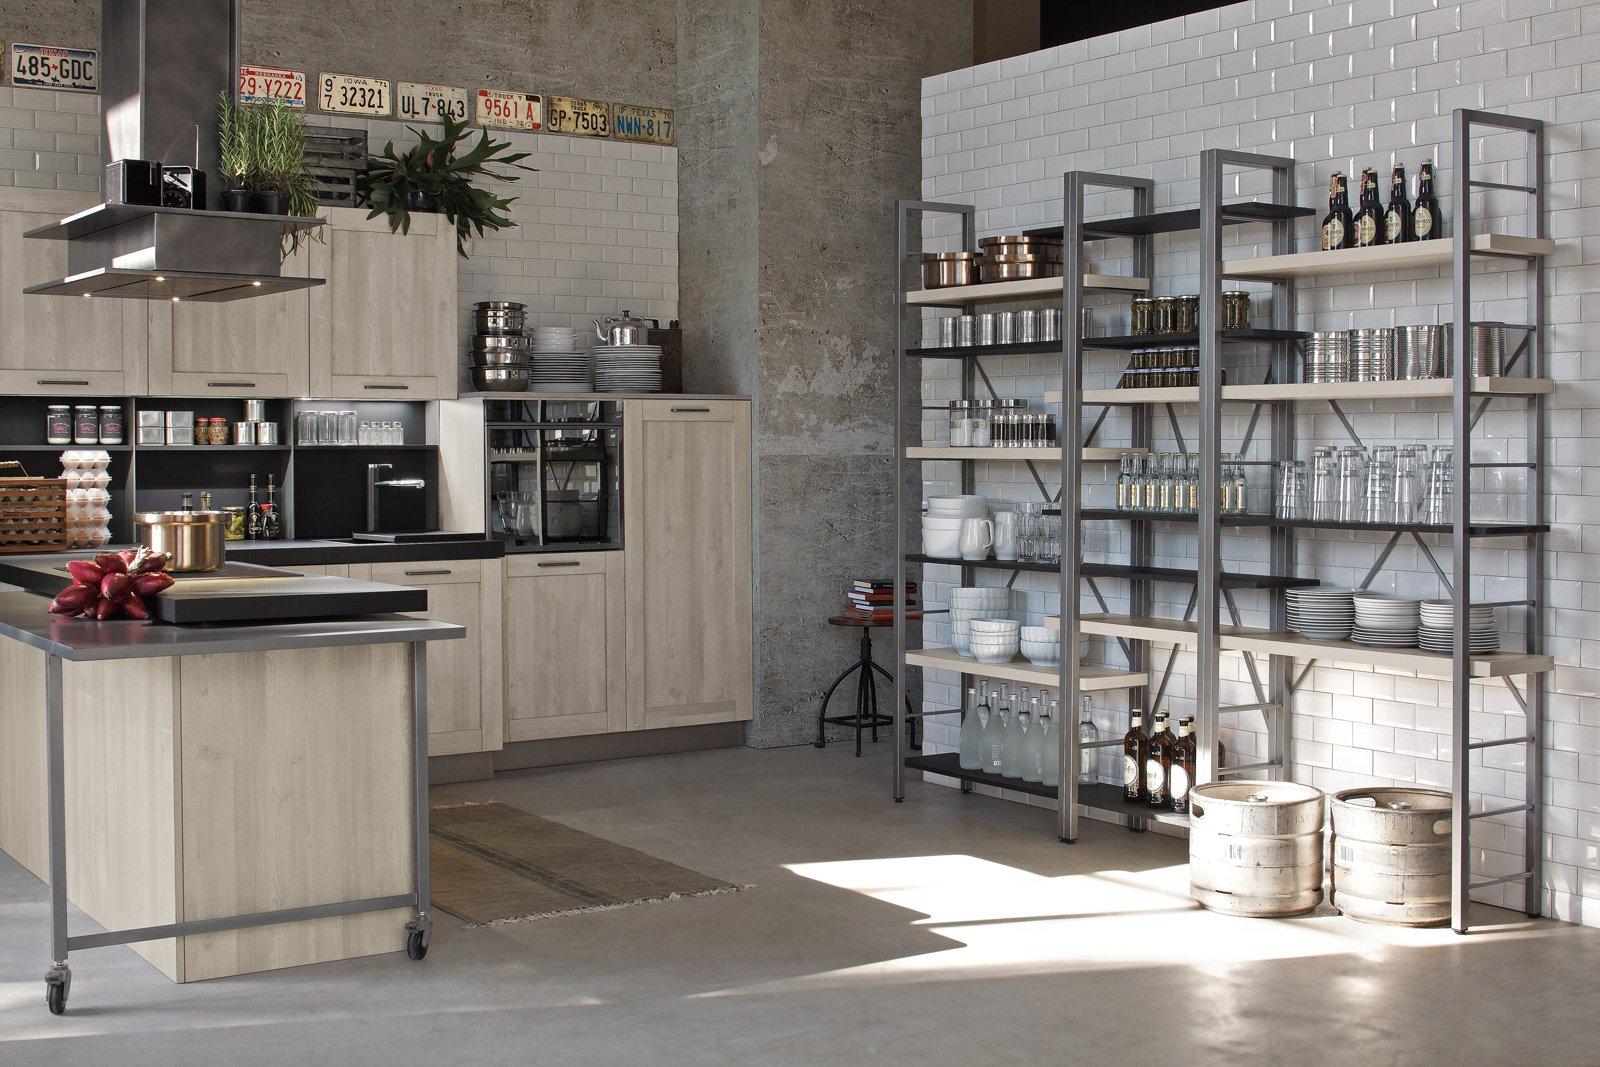 Cucine in stile industriale materiche e vissute cose di - Cucina stile vintage ...